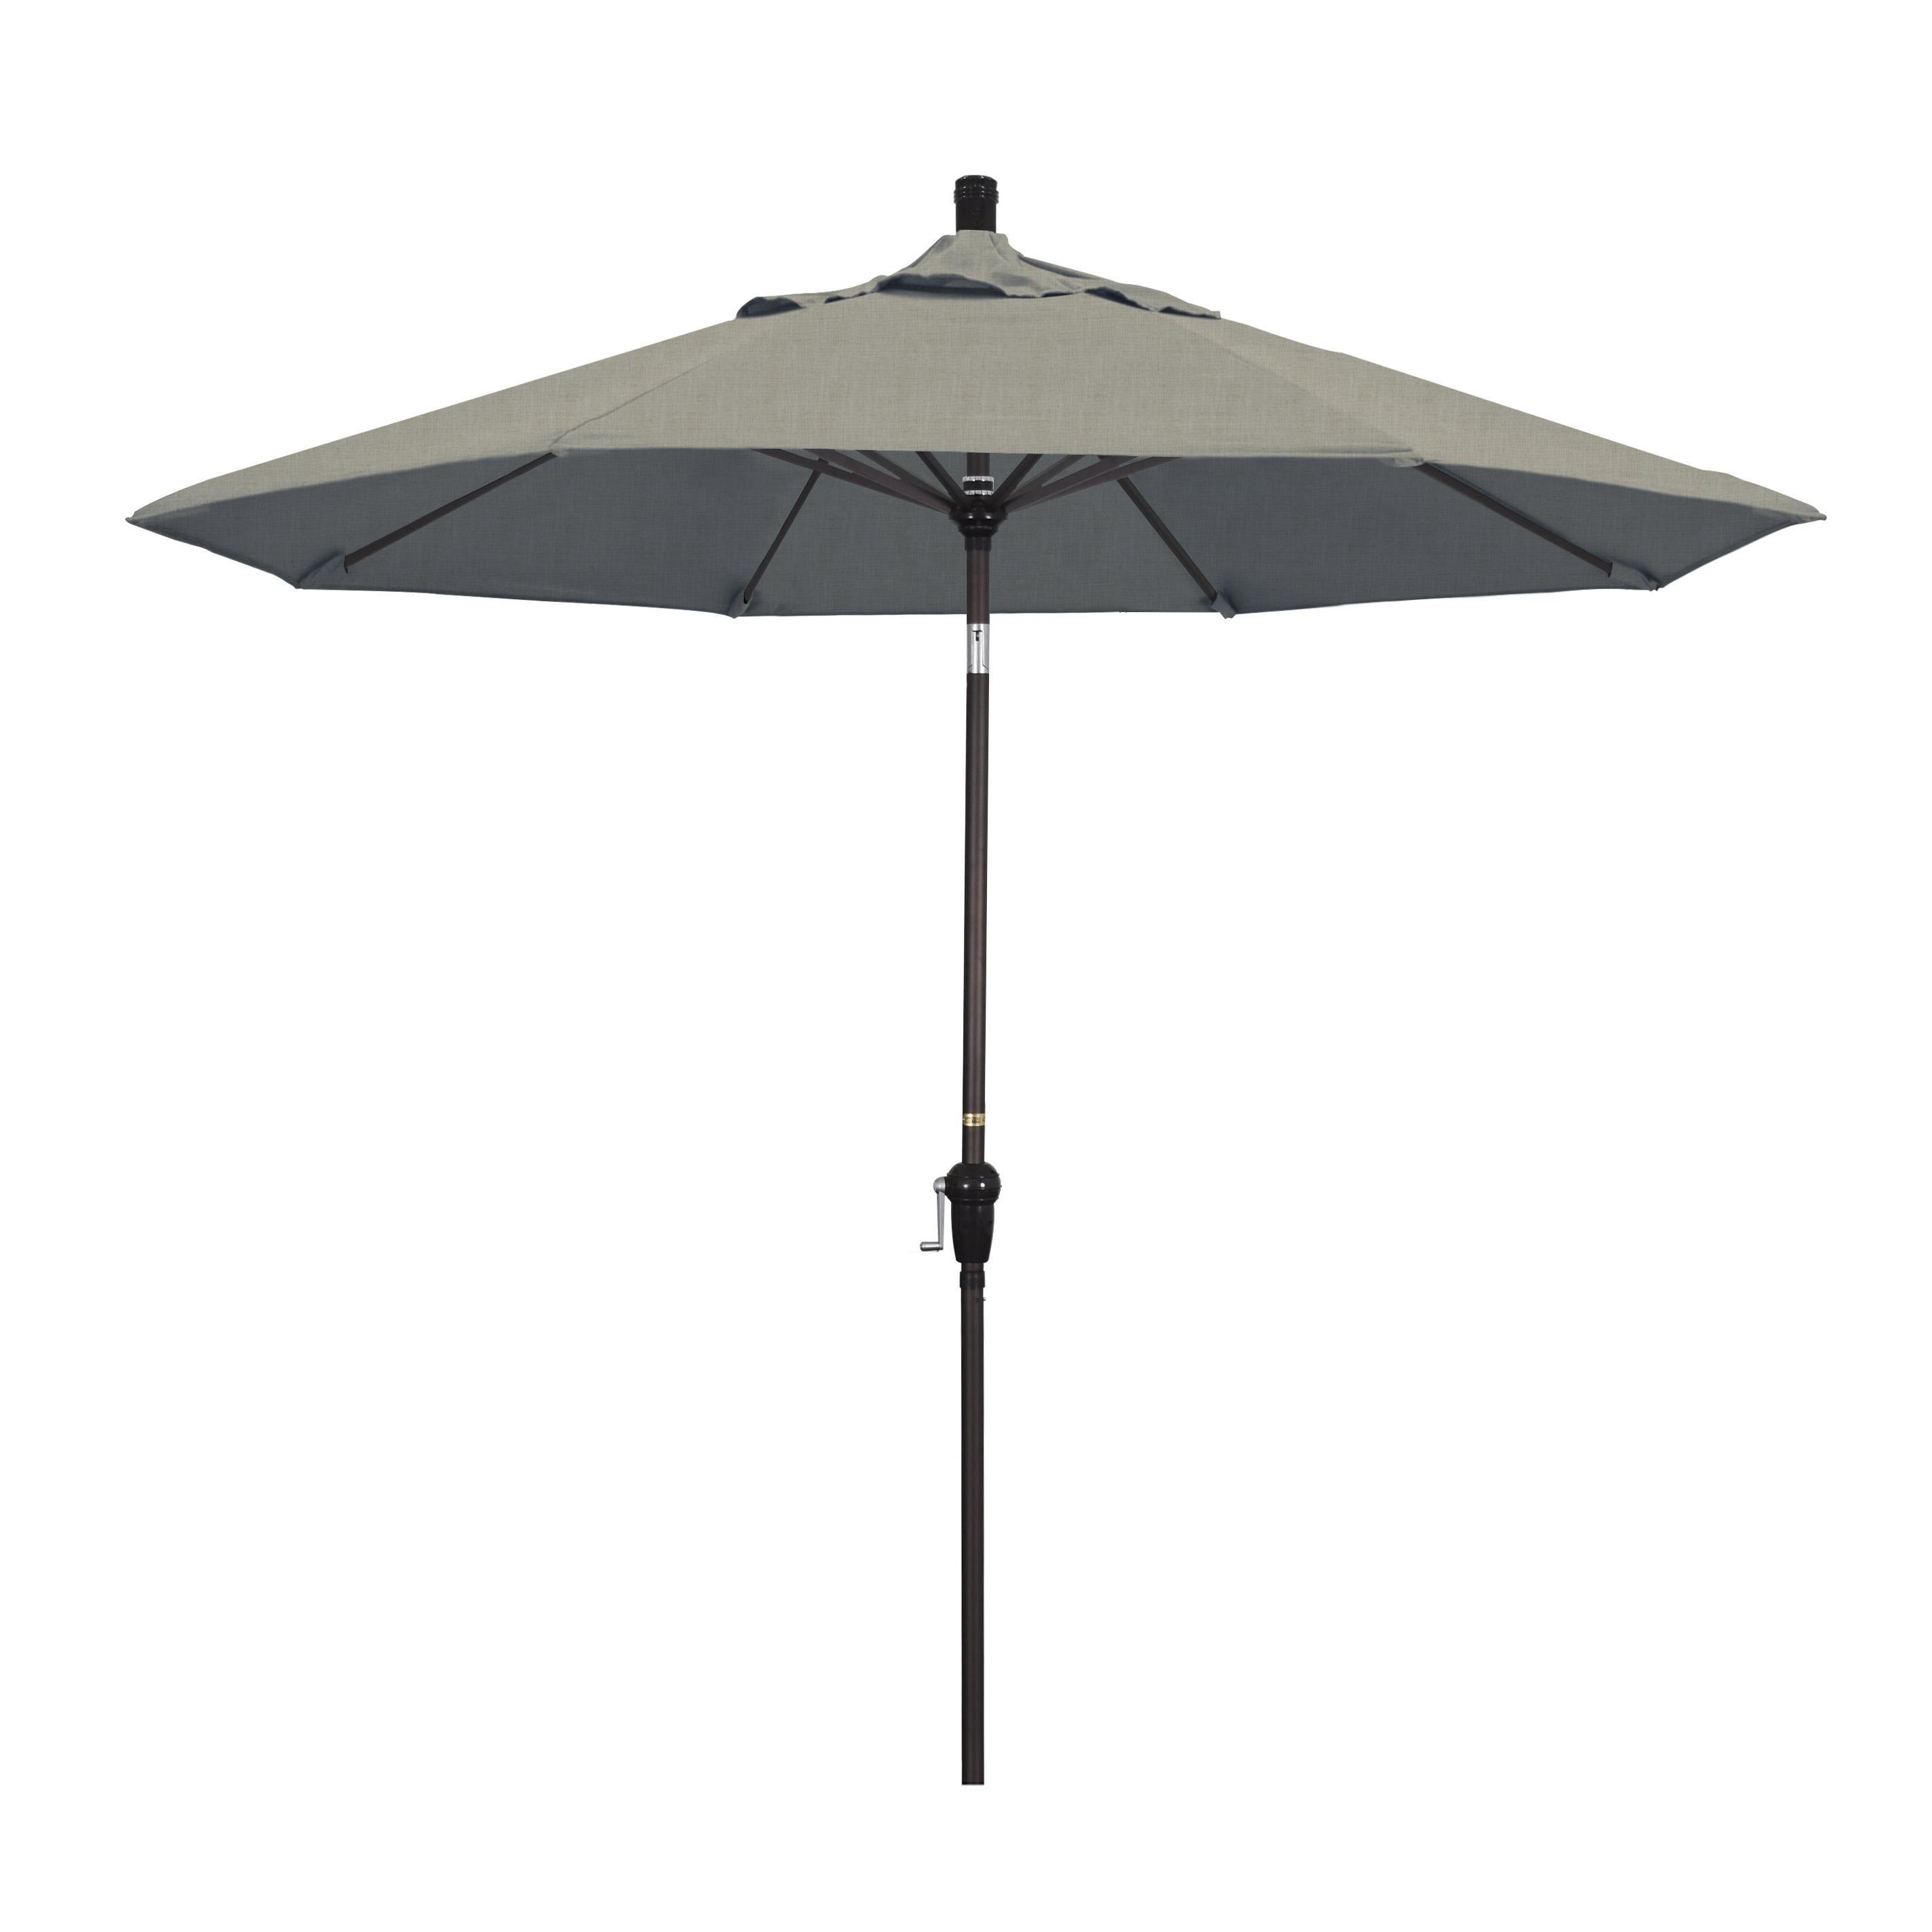 Caravelle Market Sunbrella Umbrellas With Regard To Fashionable Mullaney 9' Market Sunbrella Umbrella (View 9 of 20)